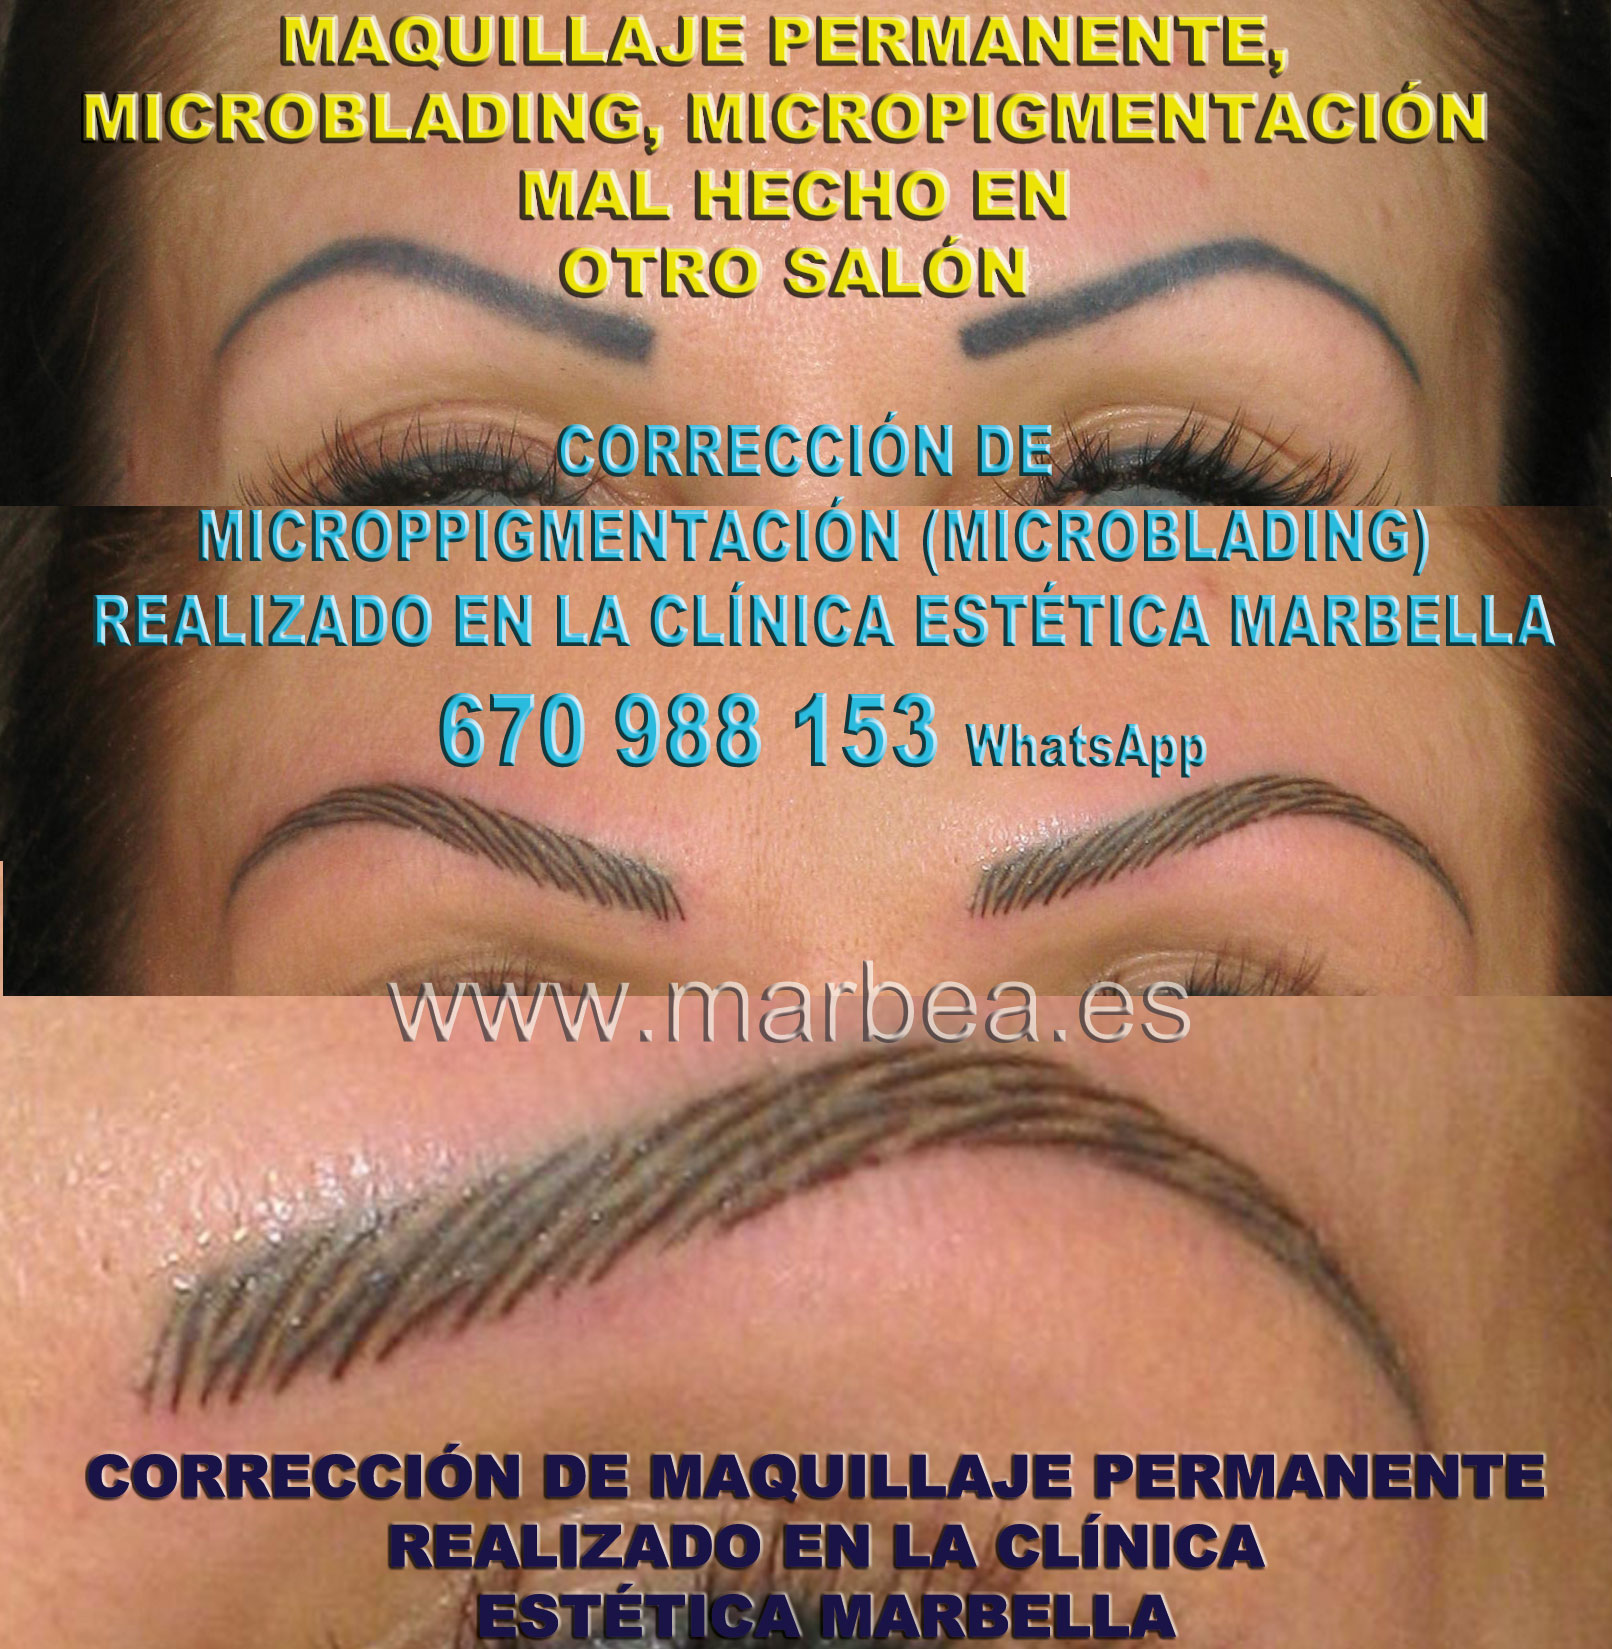 QUITAR TATUAJE CEJAS clínica estética tatuaje propone micropigmentacion correctiva de cejas,corregir micropigmentación no deseada